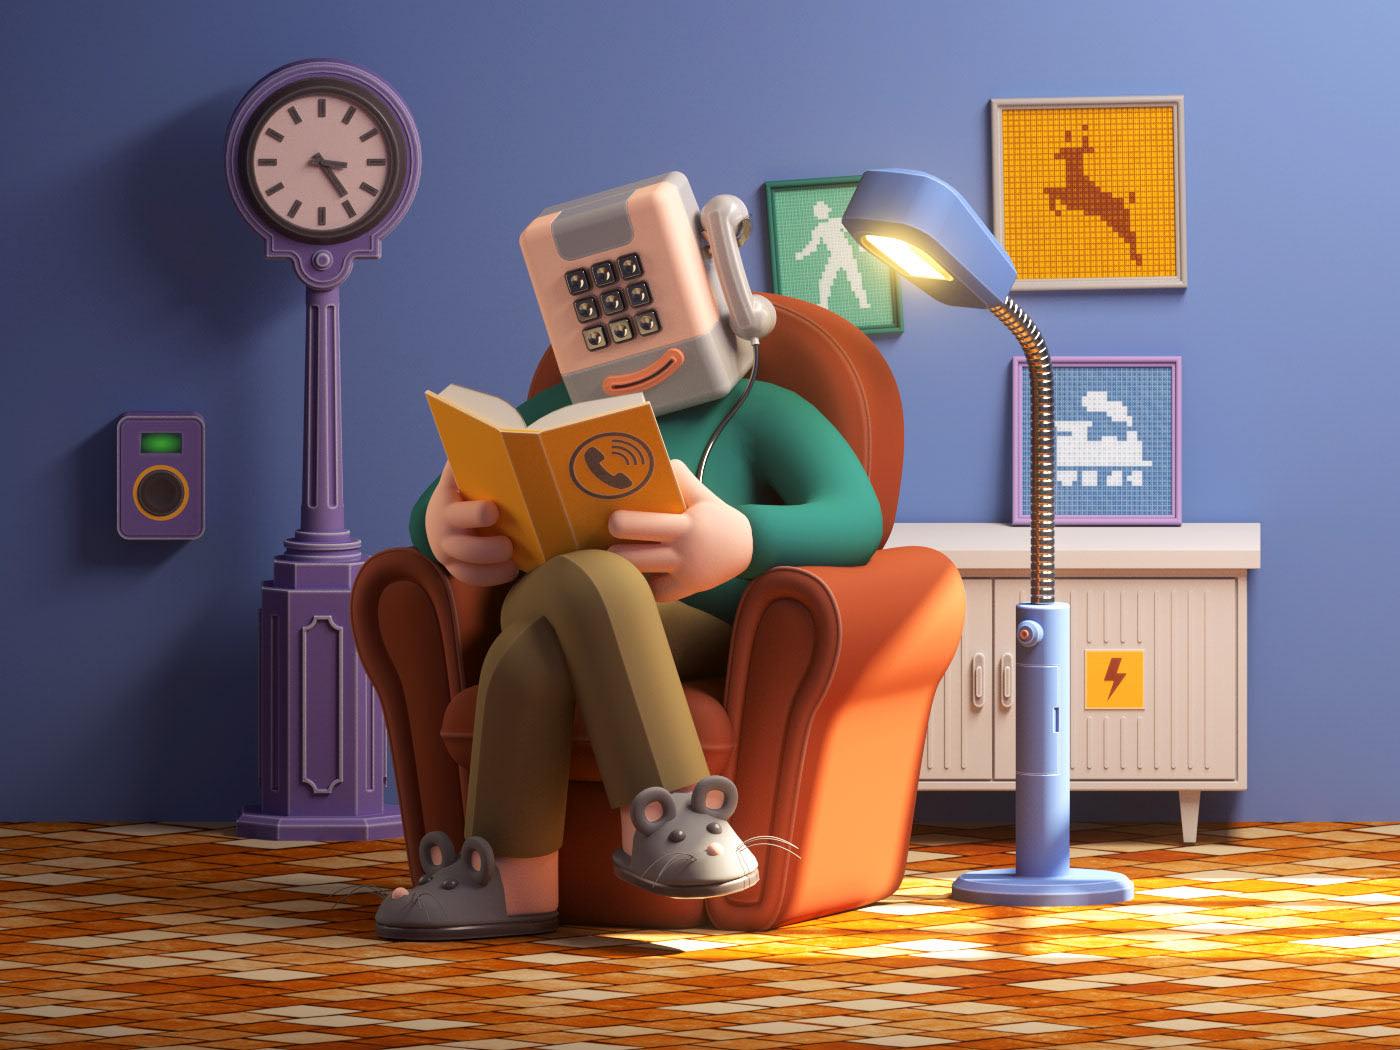 Character Design, Digital Art, Illustration